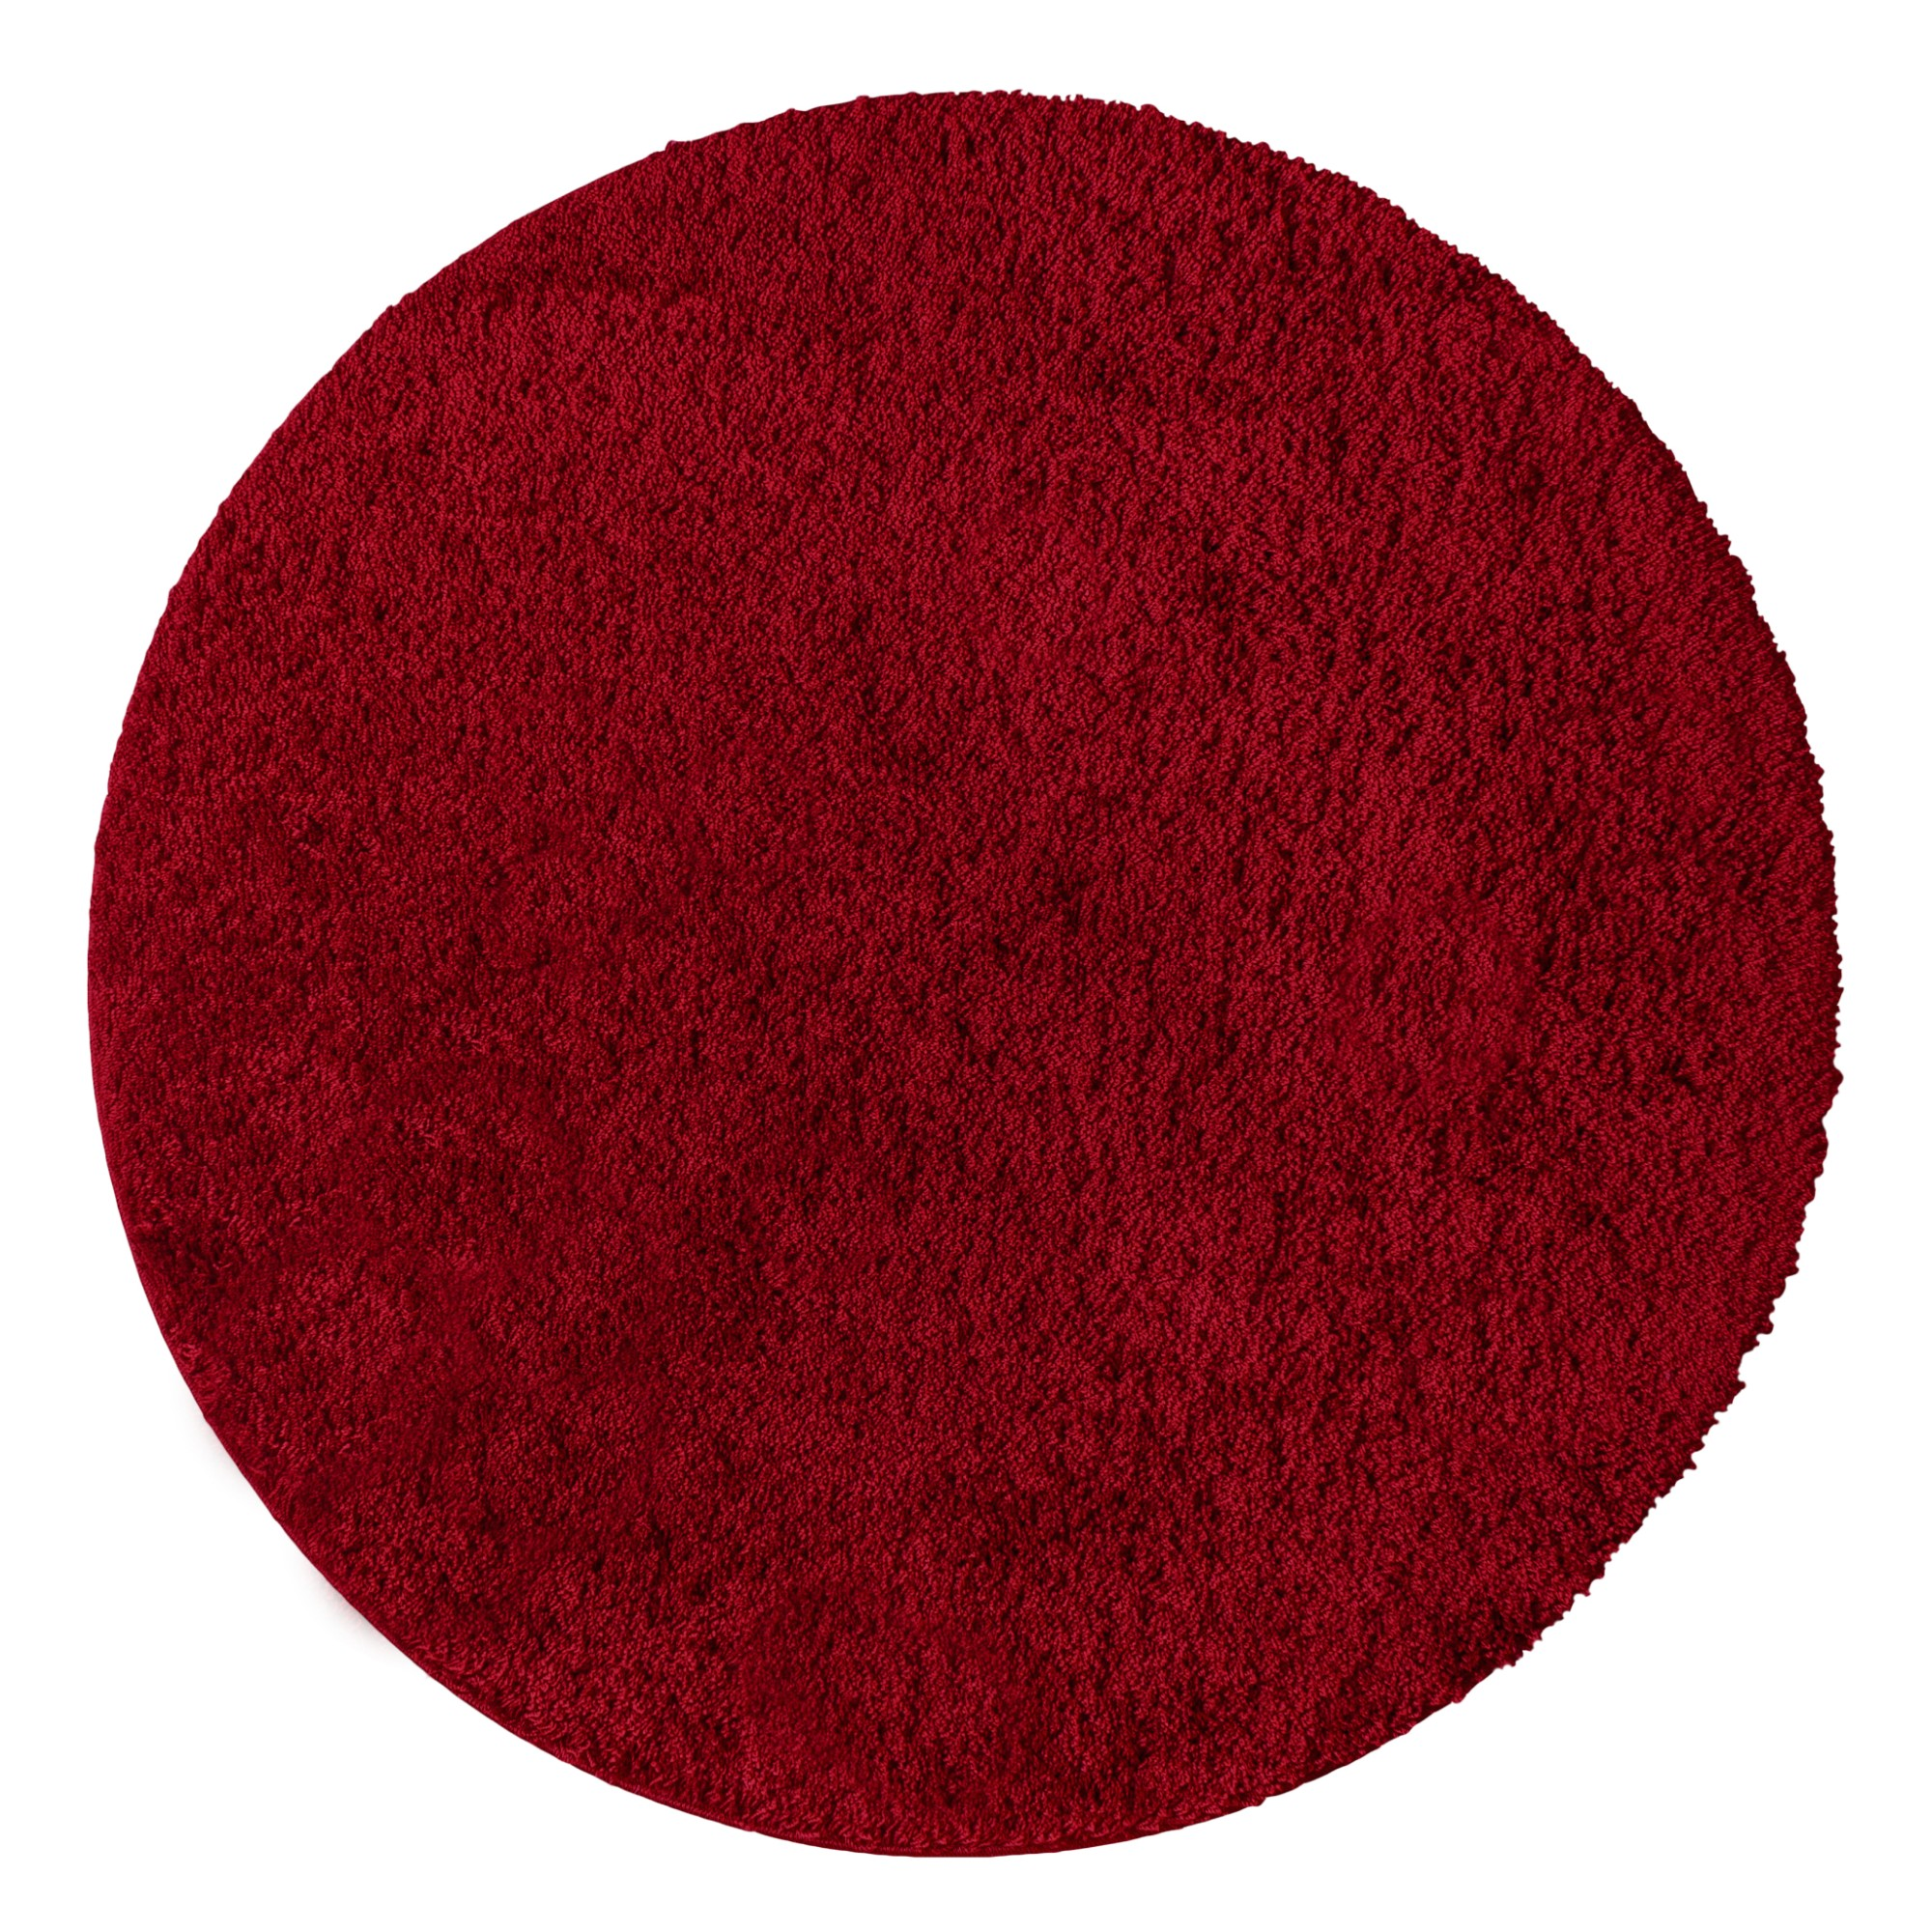 Tapete Realce 150x150 cm Redondo Vermelho - Jolitex